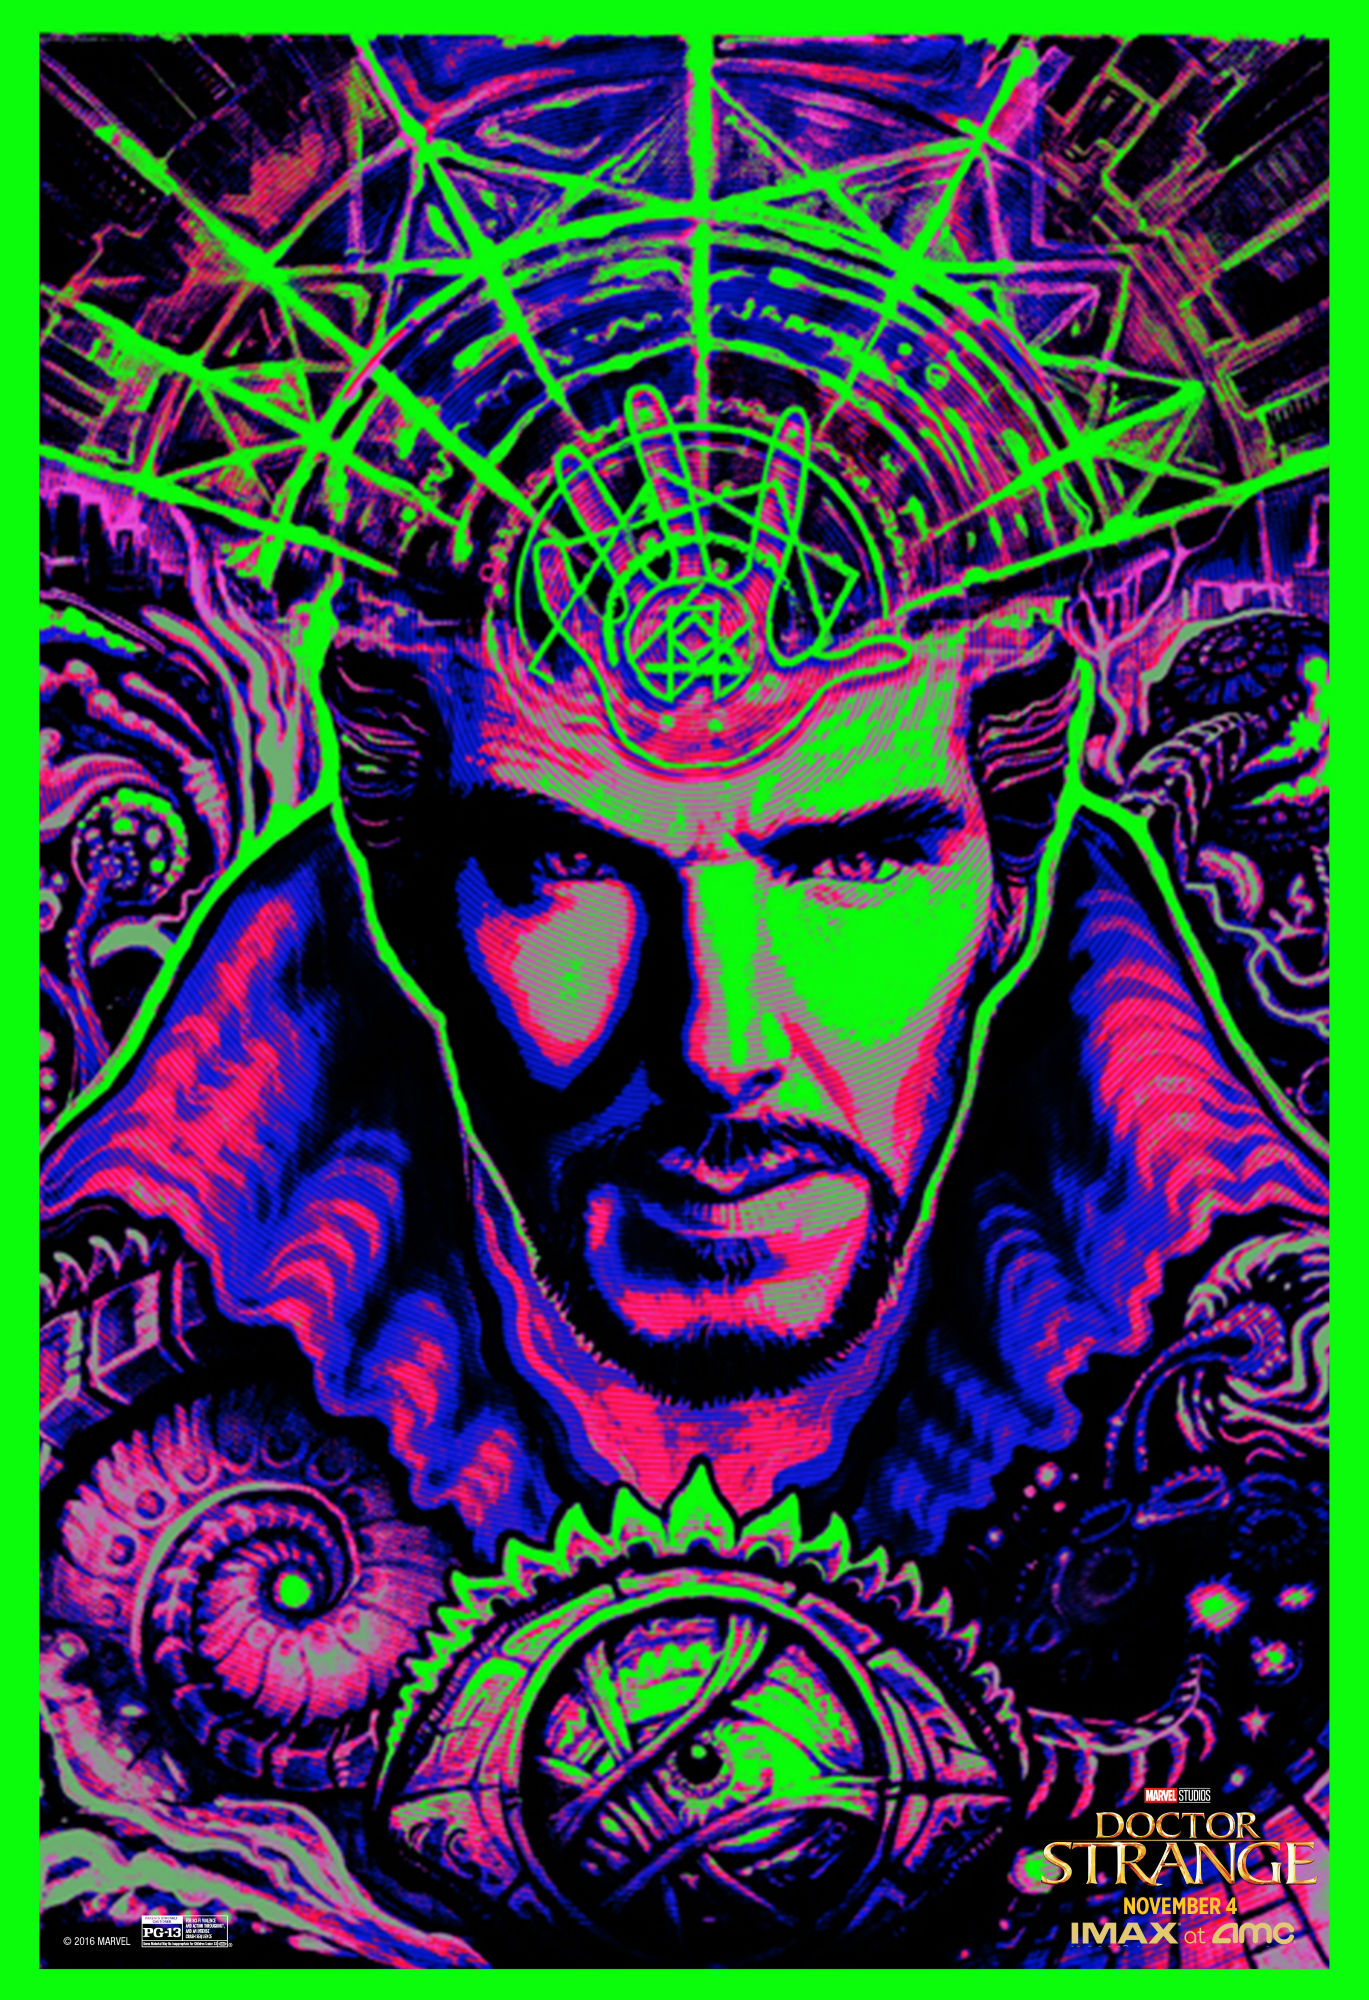 szmk_doctor_strange_marvel_movie_poster.jpg